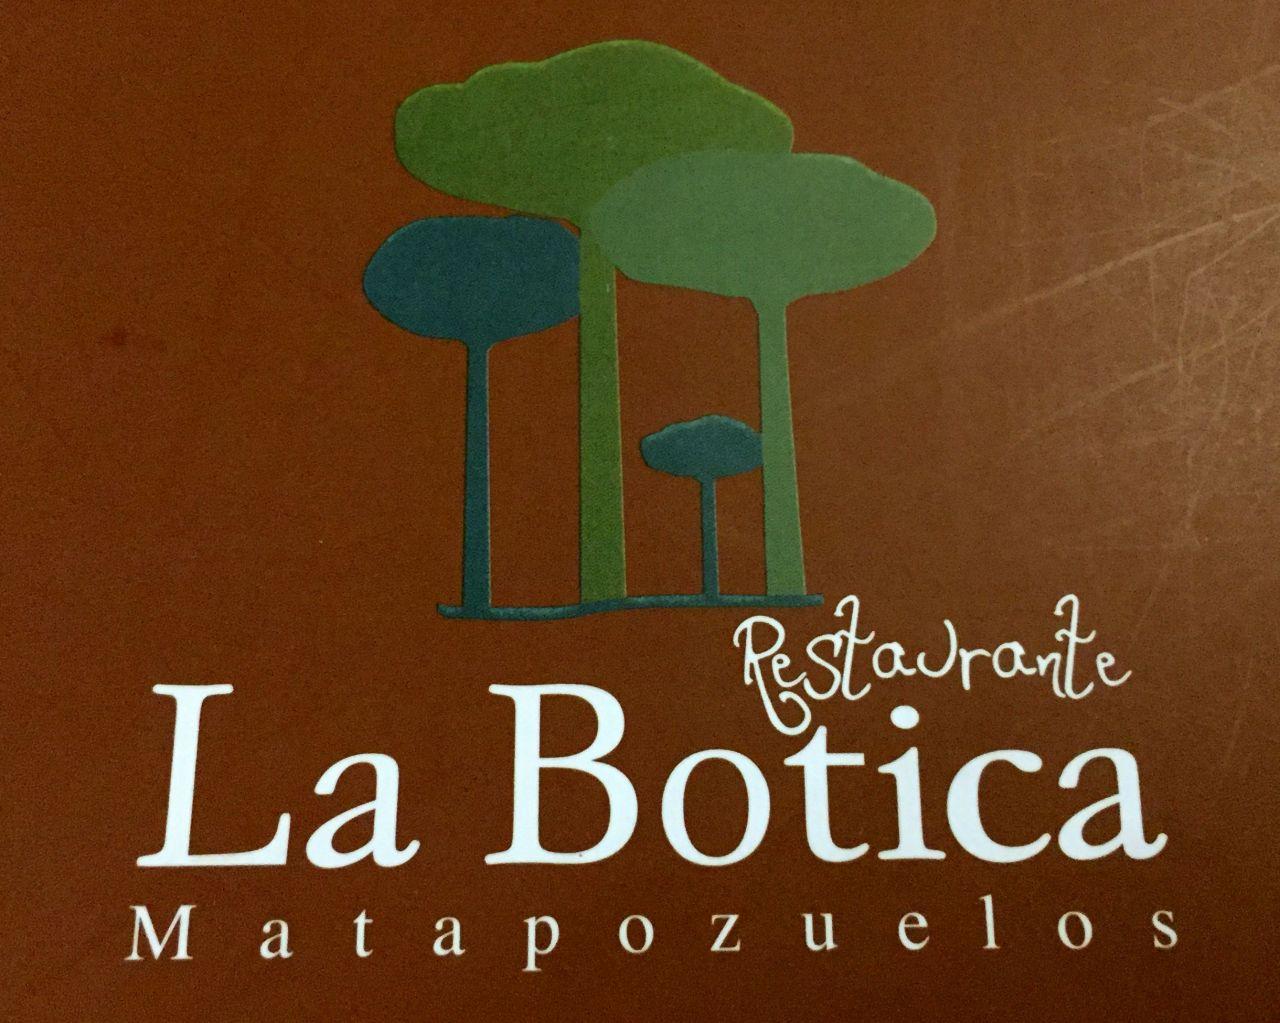 La Botica deMatapozuelos